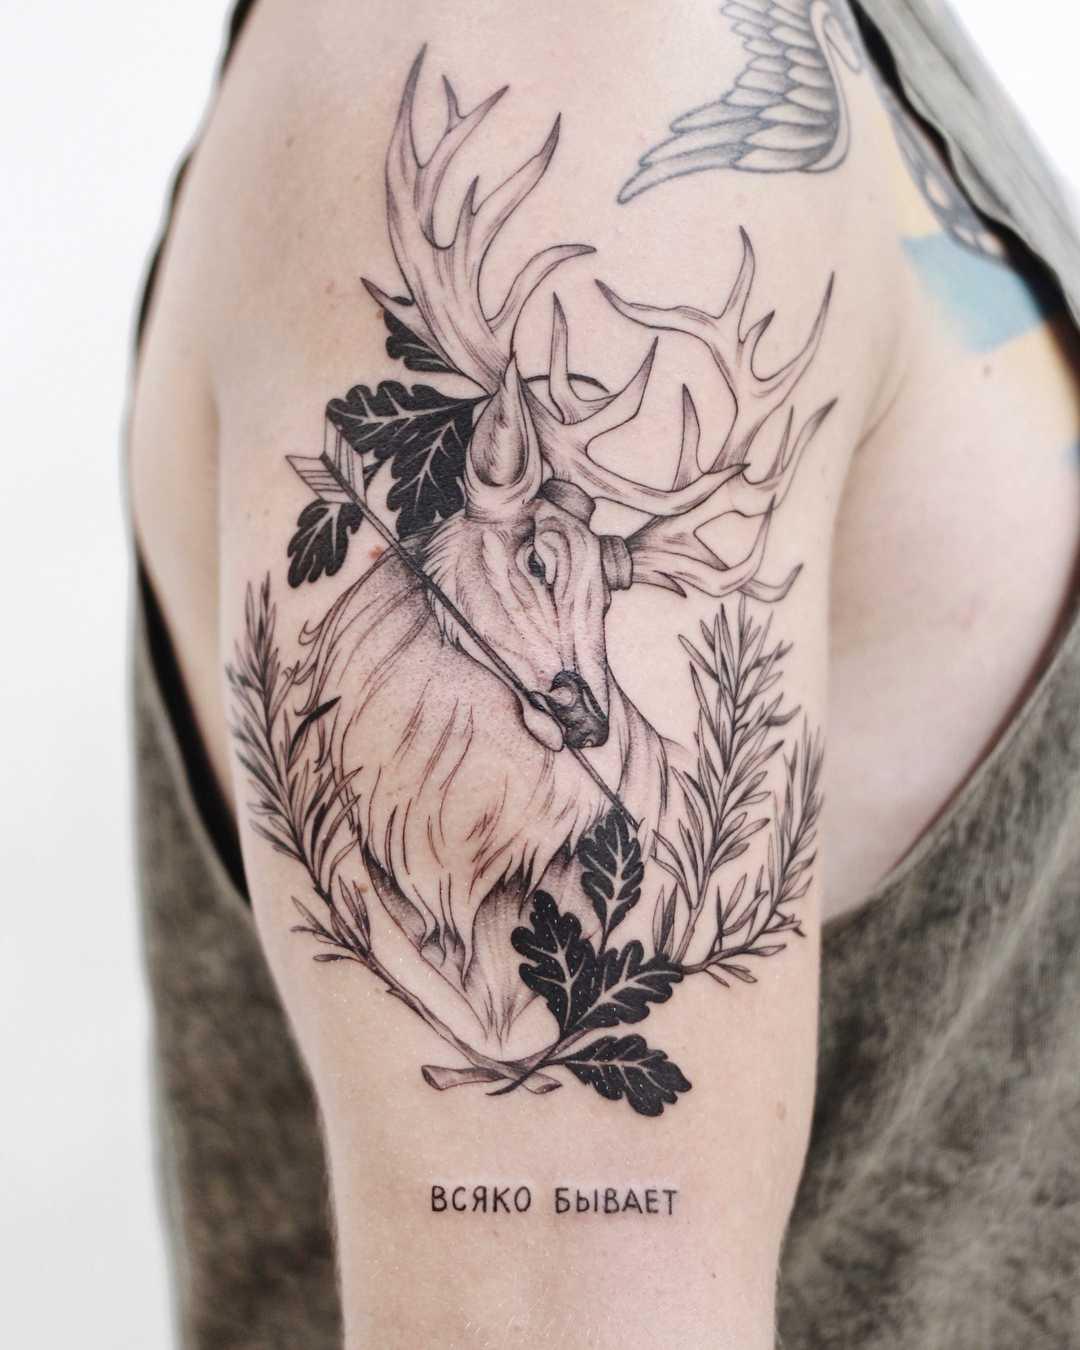 Forest spirit tattoo by Finley Jordan